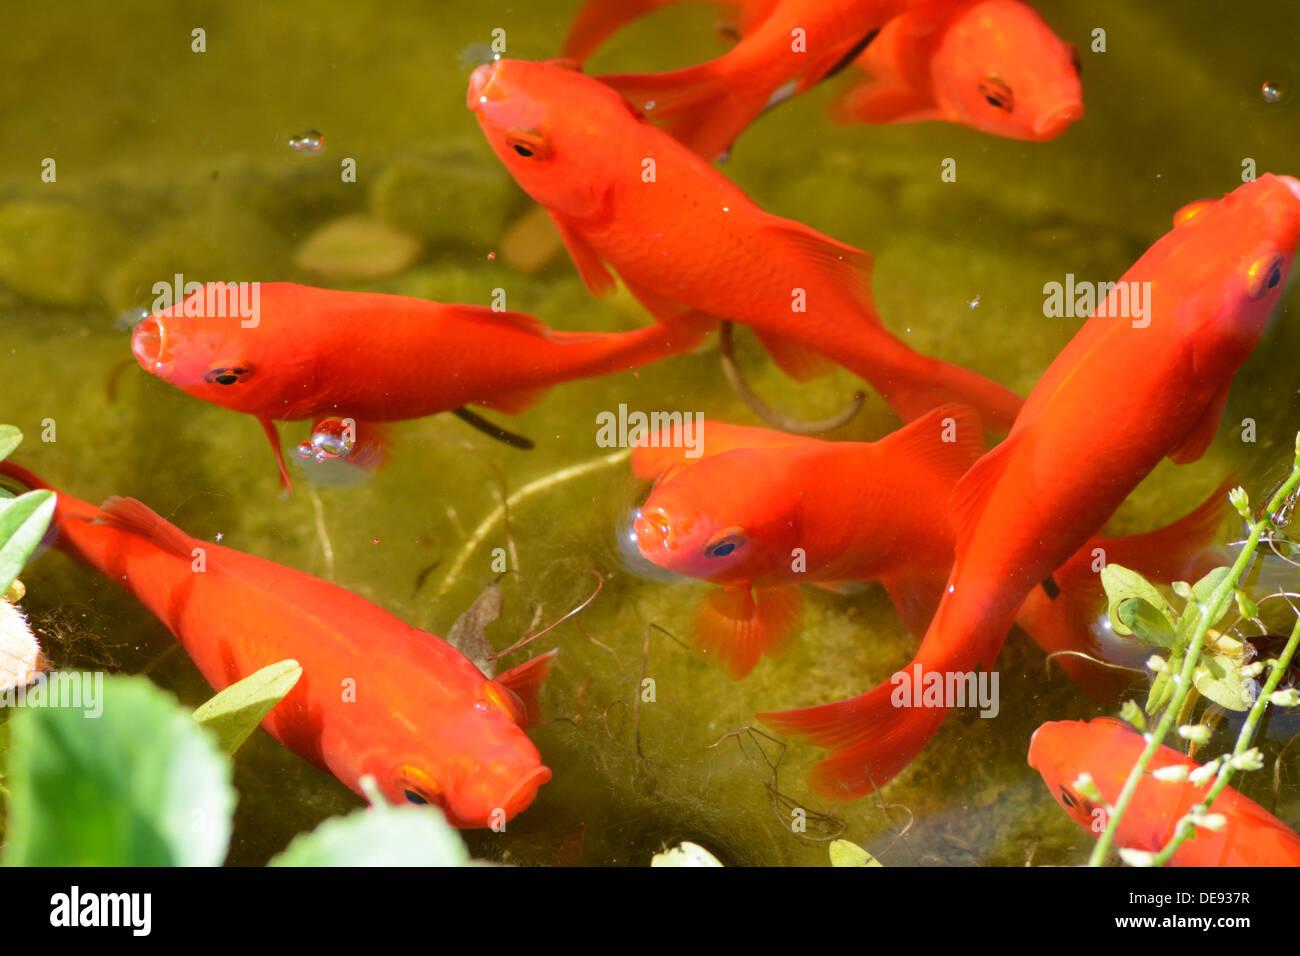 Fancy Color Glass Fish Images - Coloring Page - senderolasbrumas.info